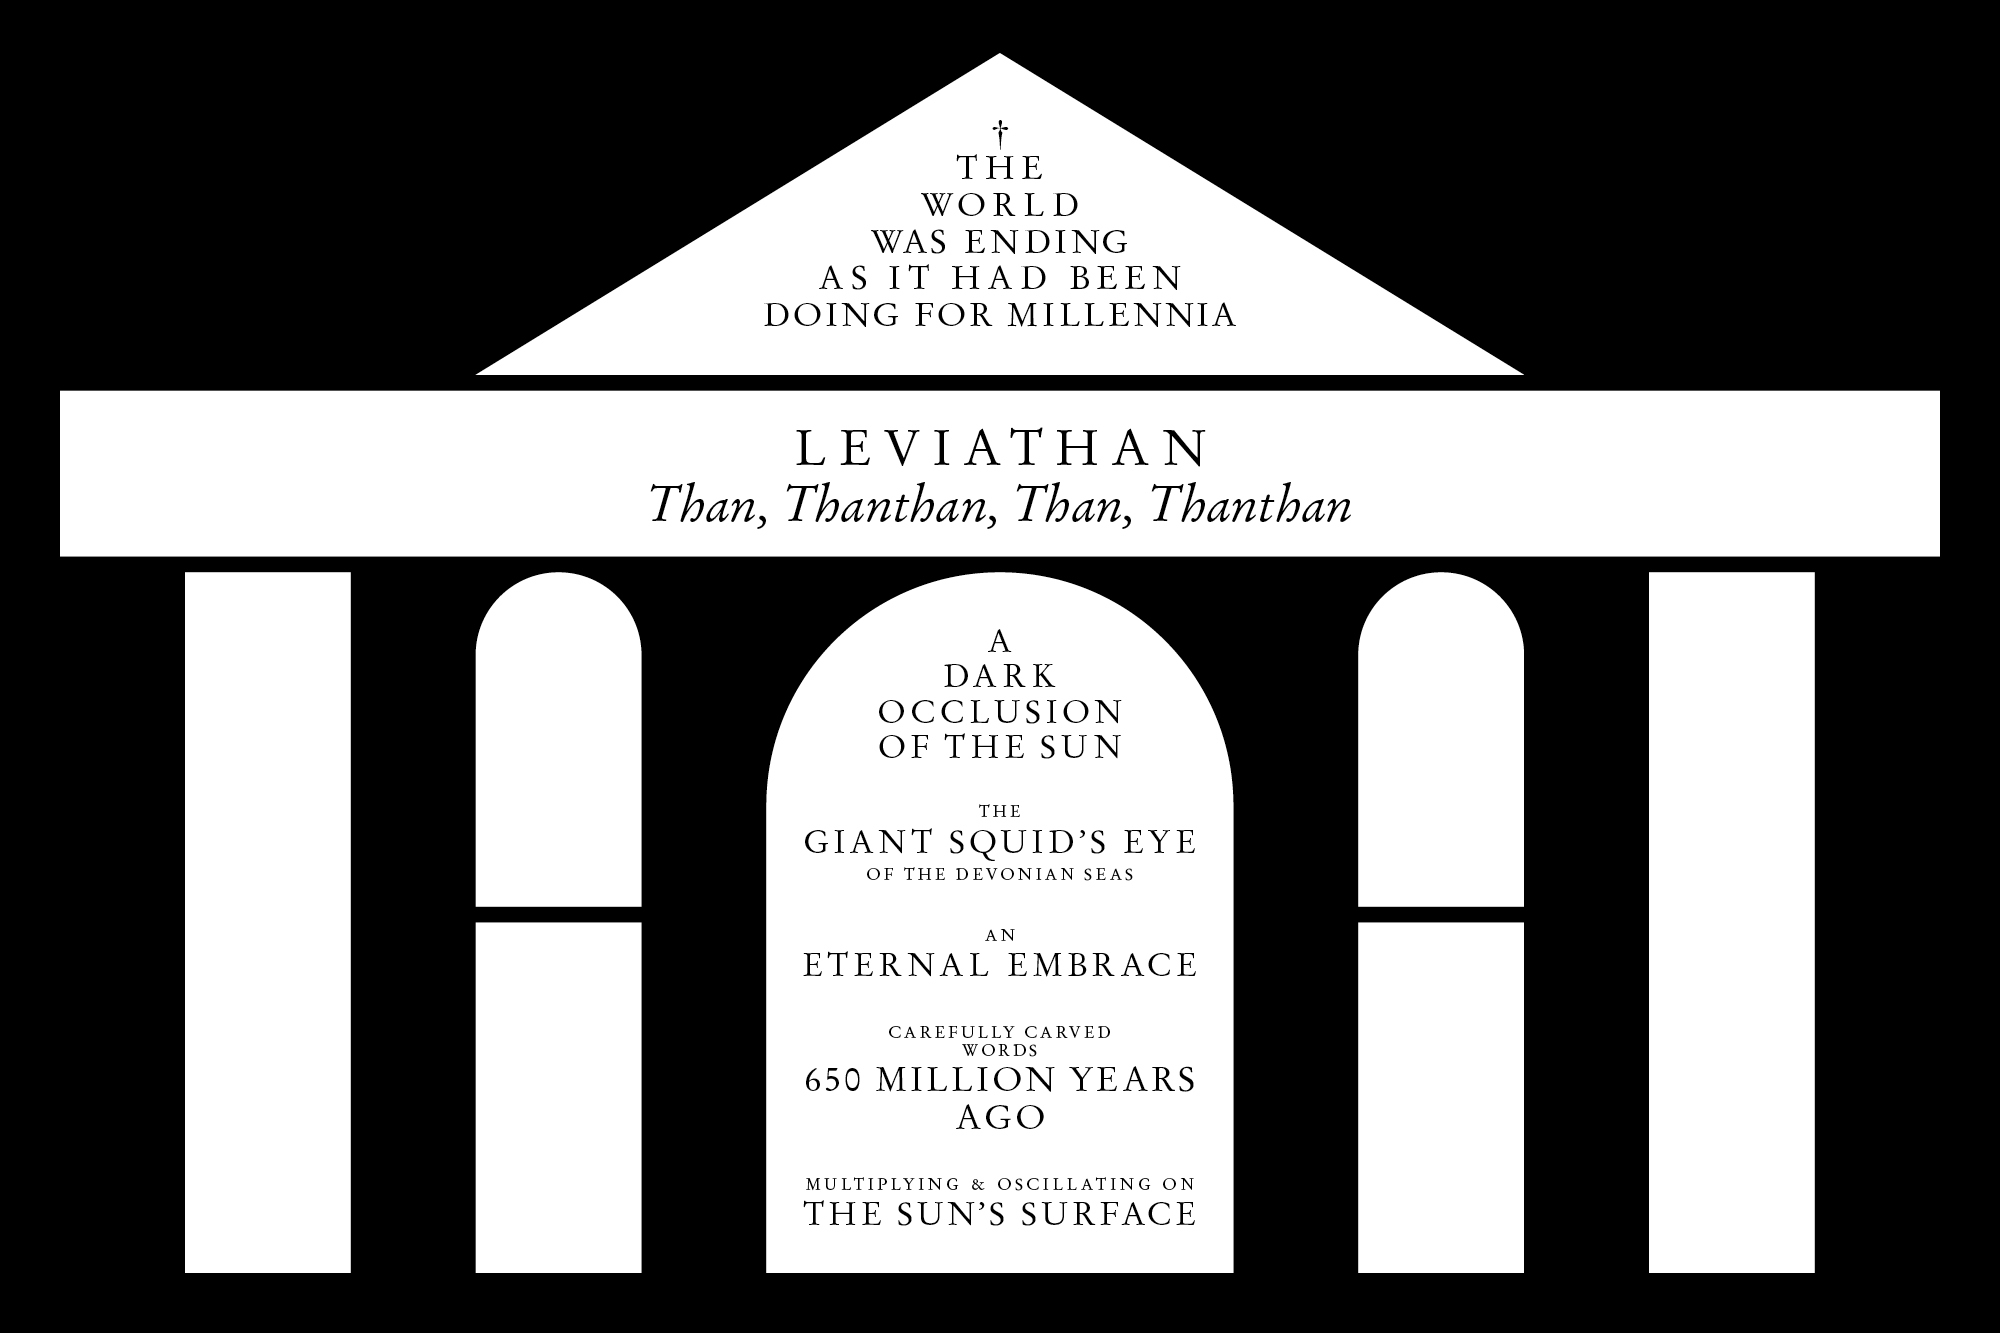 Leviathan, Shezad Dawood